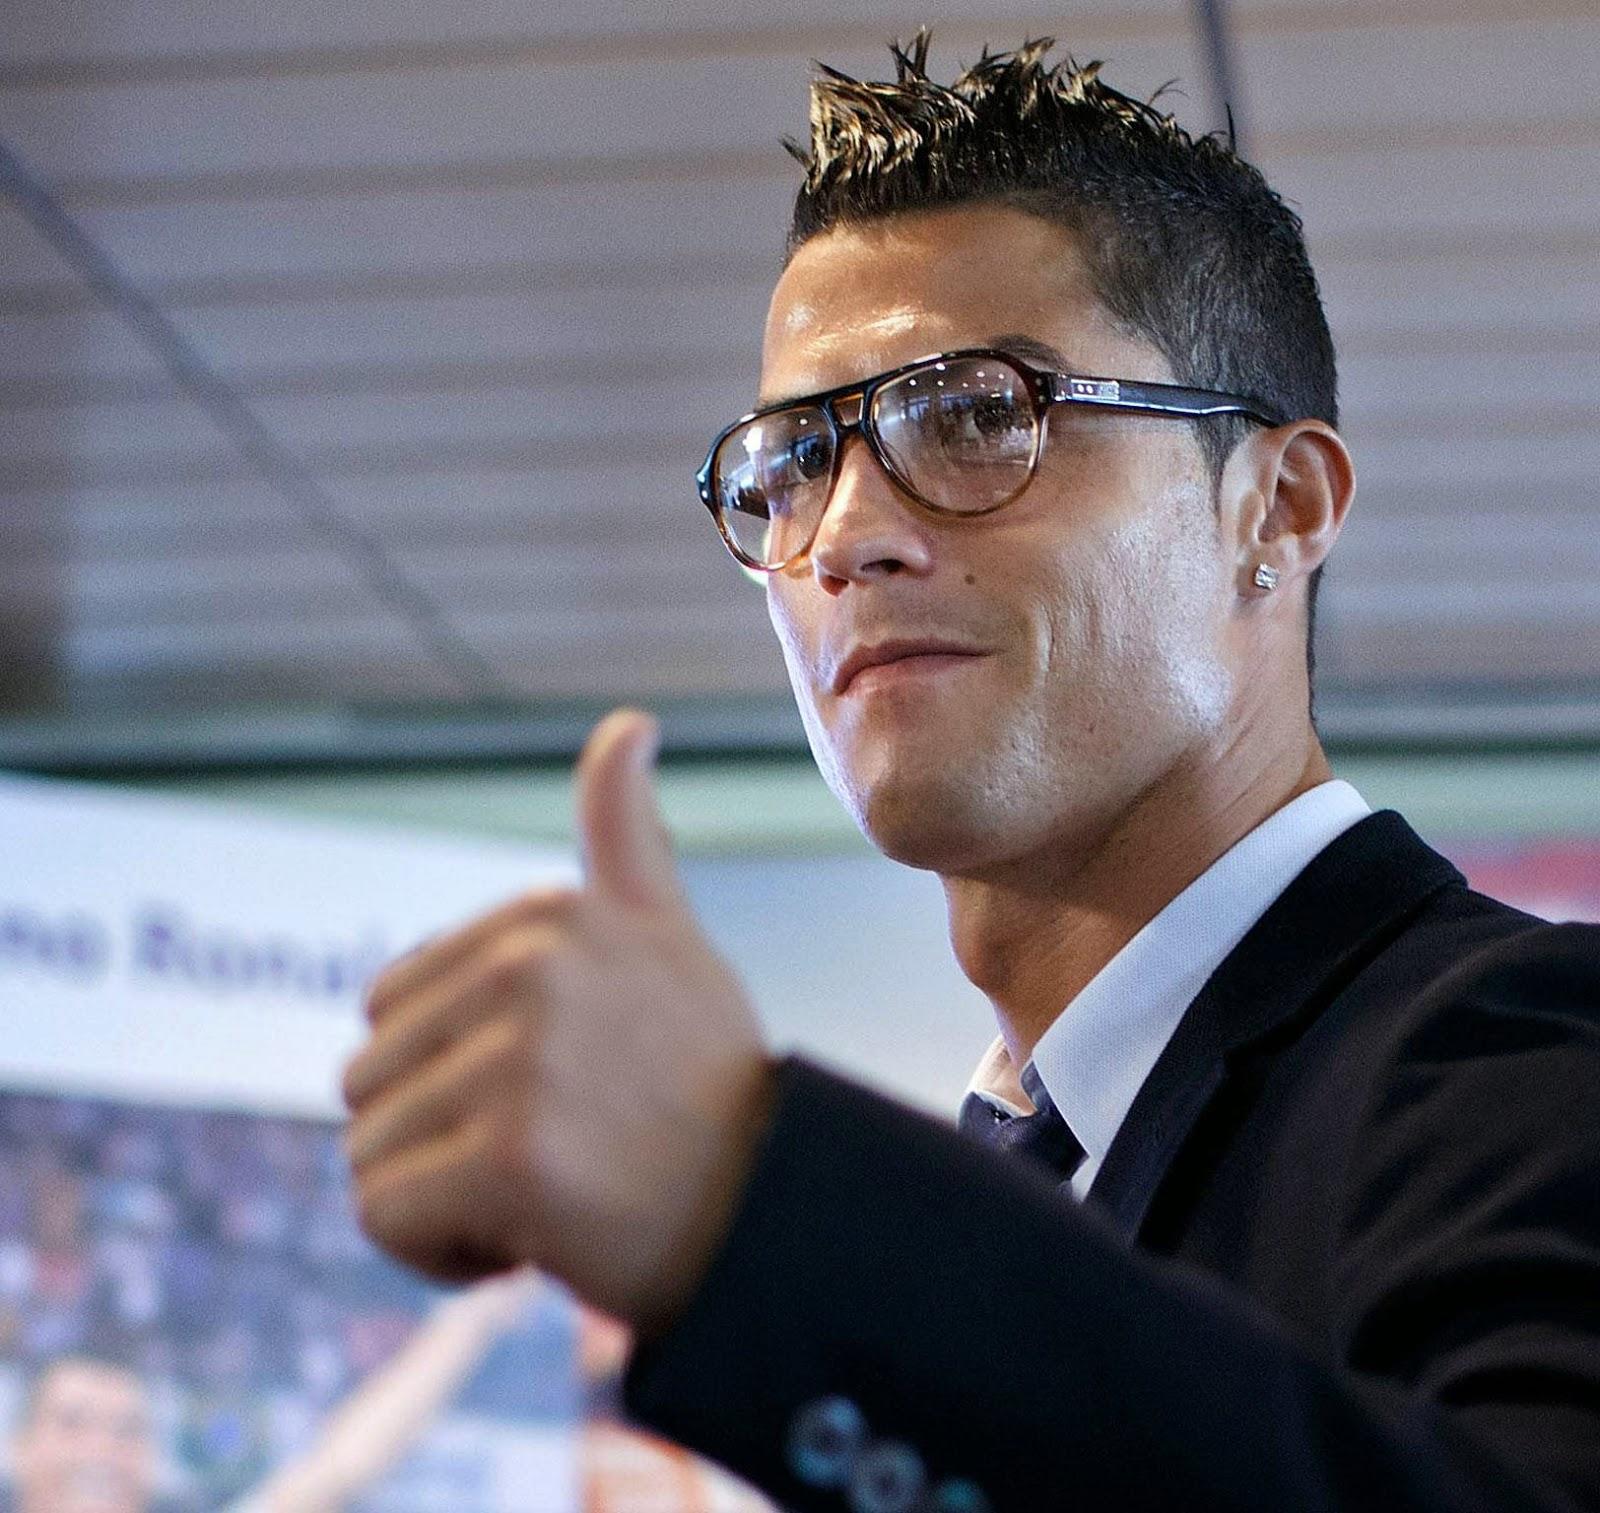 2014 02 cristiano ronaldo hair style image 2014 03 cristiano ronaldoCristiano Ronaldo Fashion Style 2014